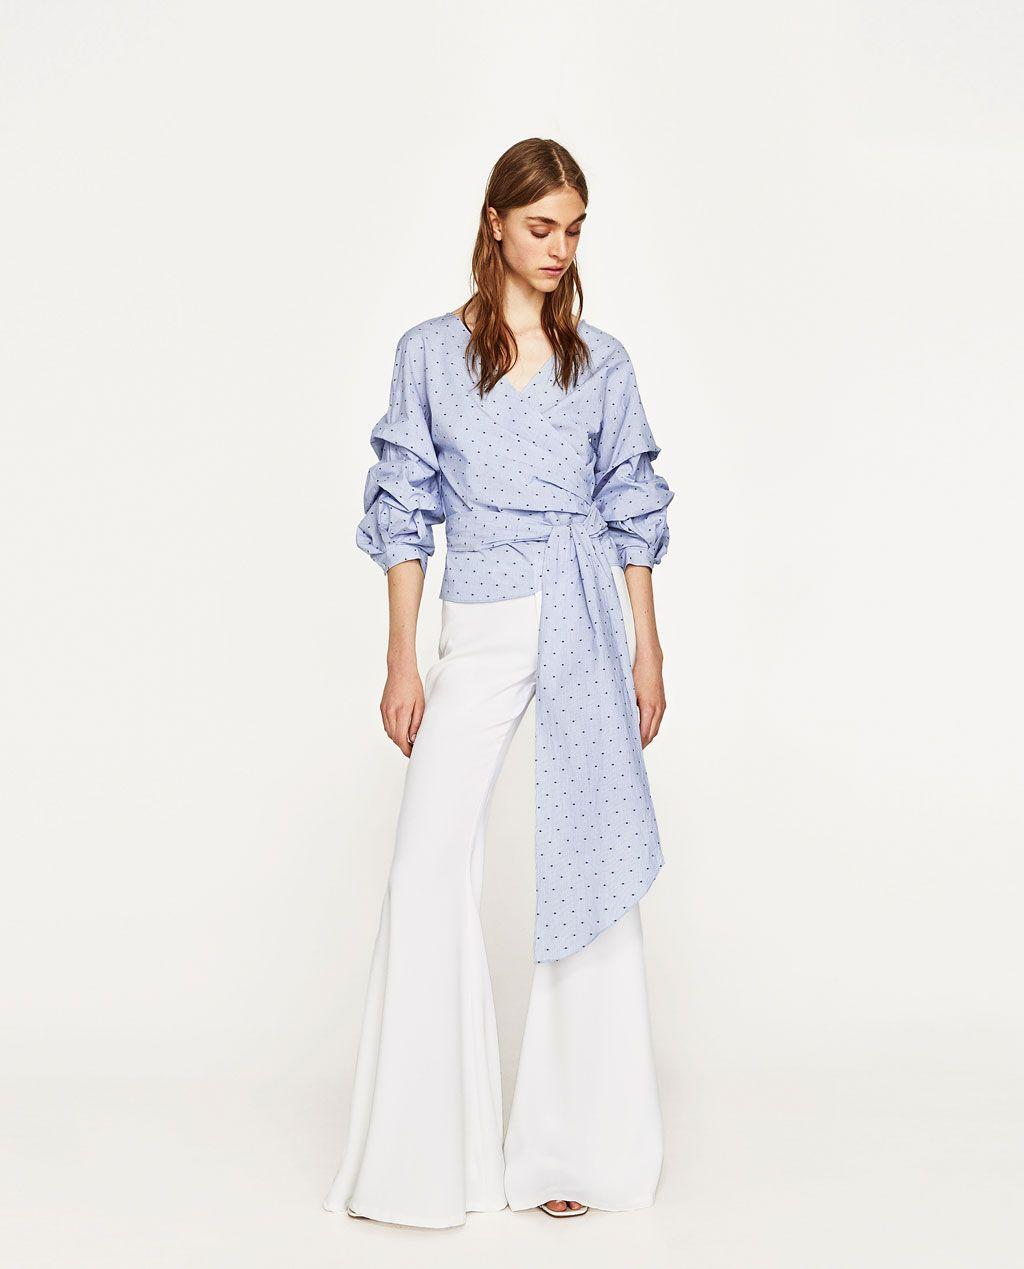 BLUSA LAZO MANGA PLIEGUES | my love is online | Pinterest | Moda ...